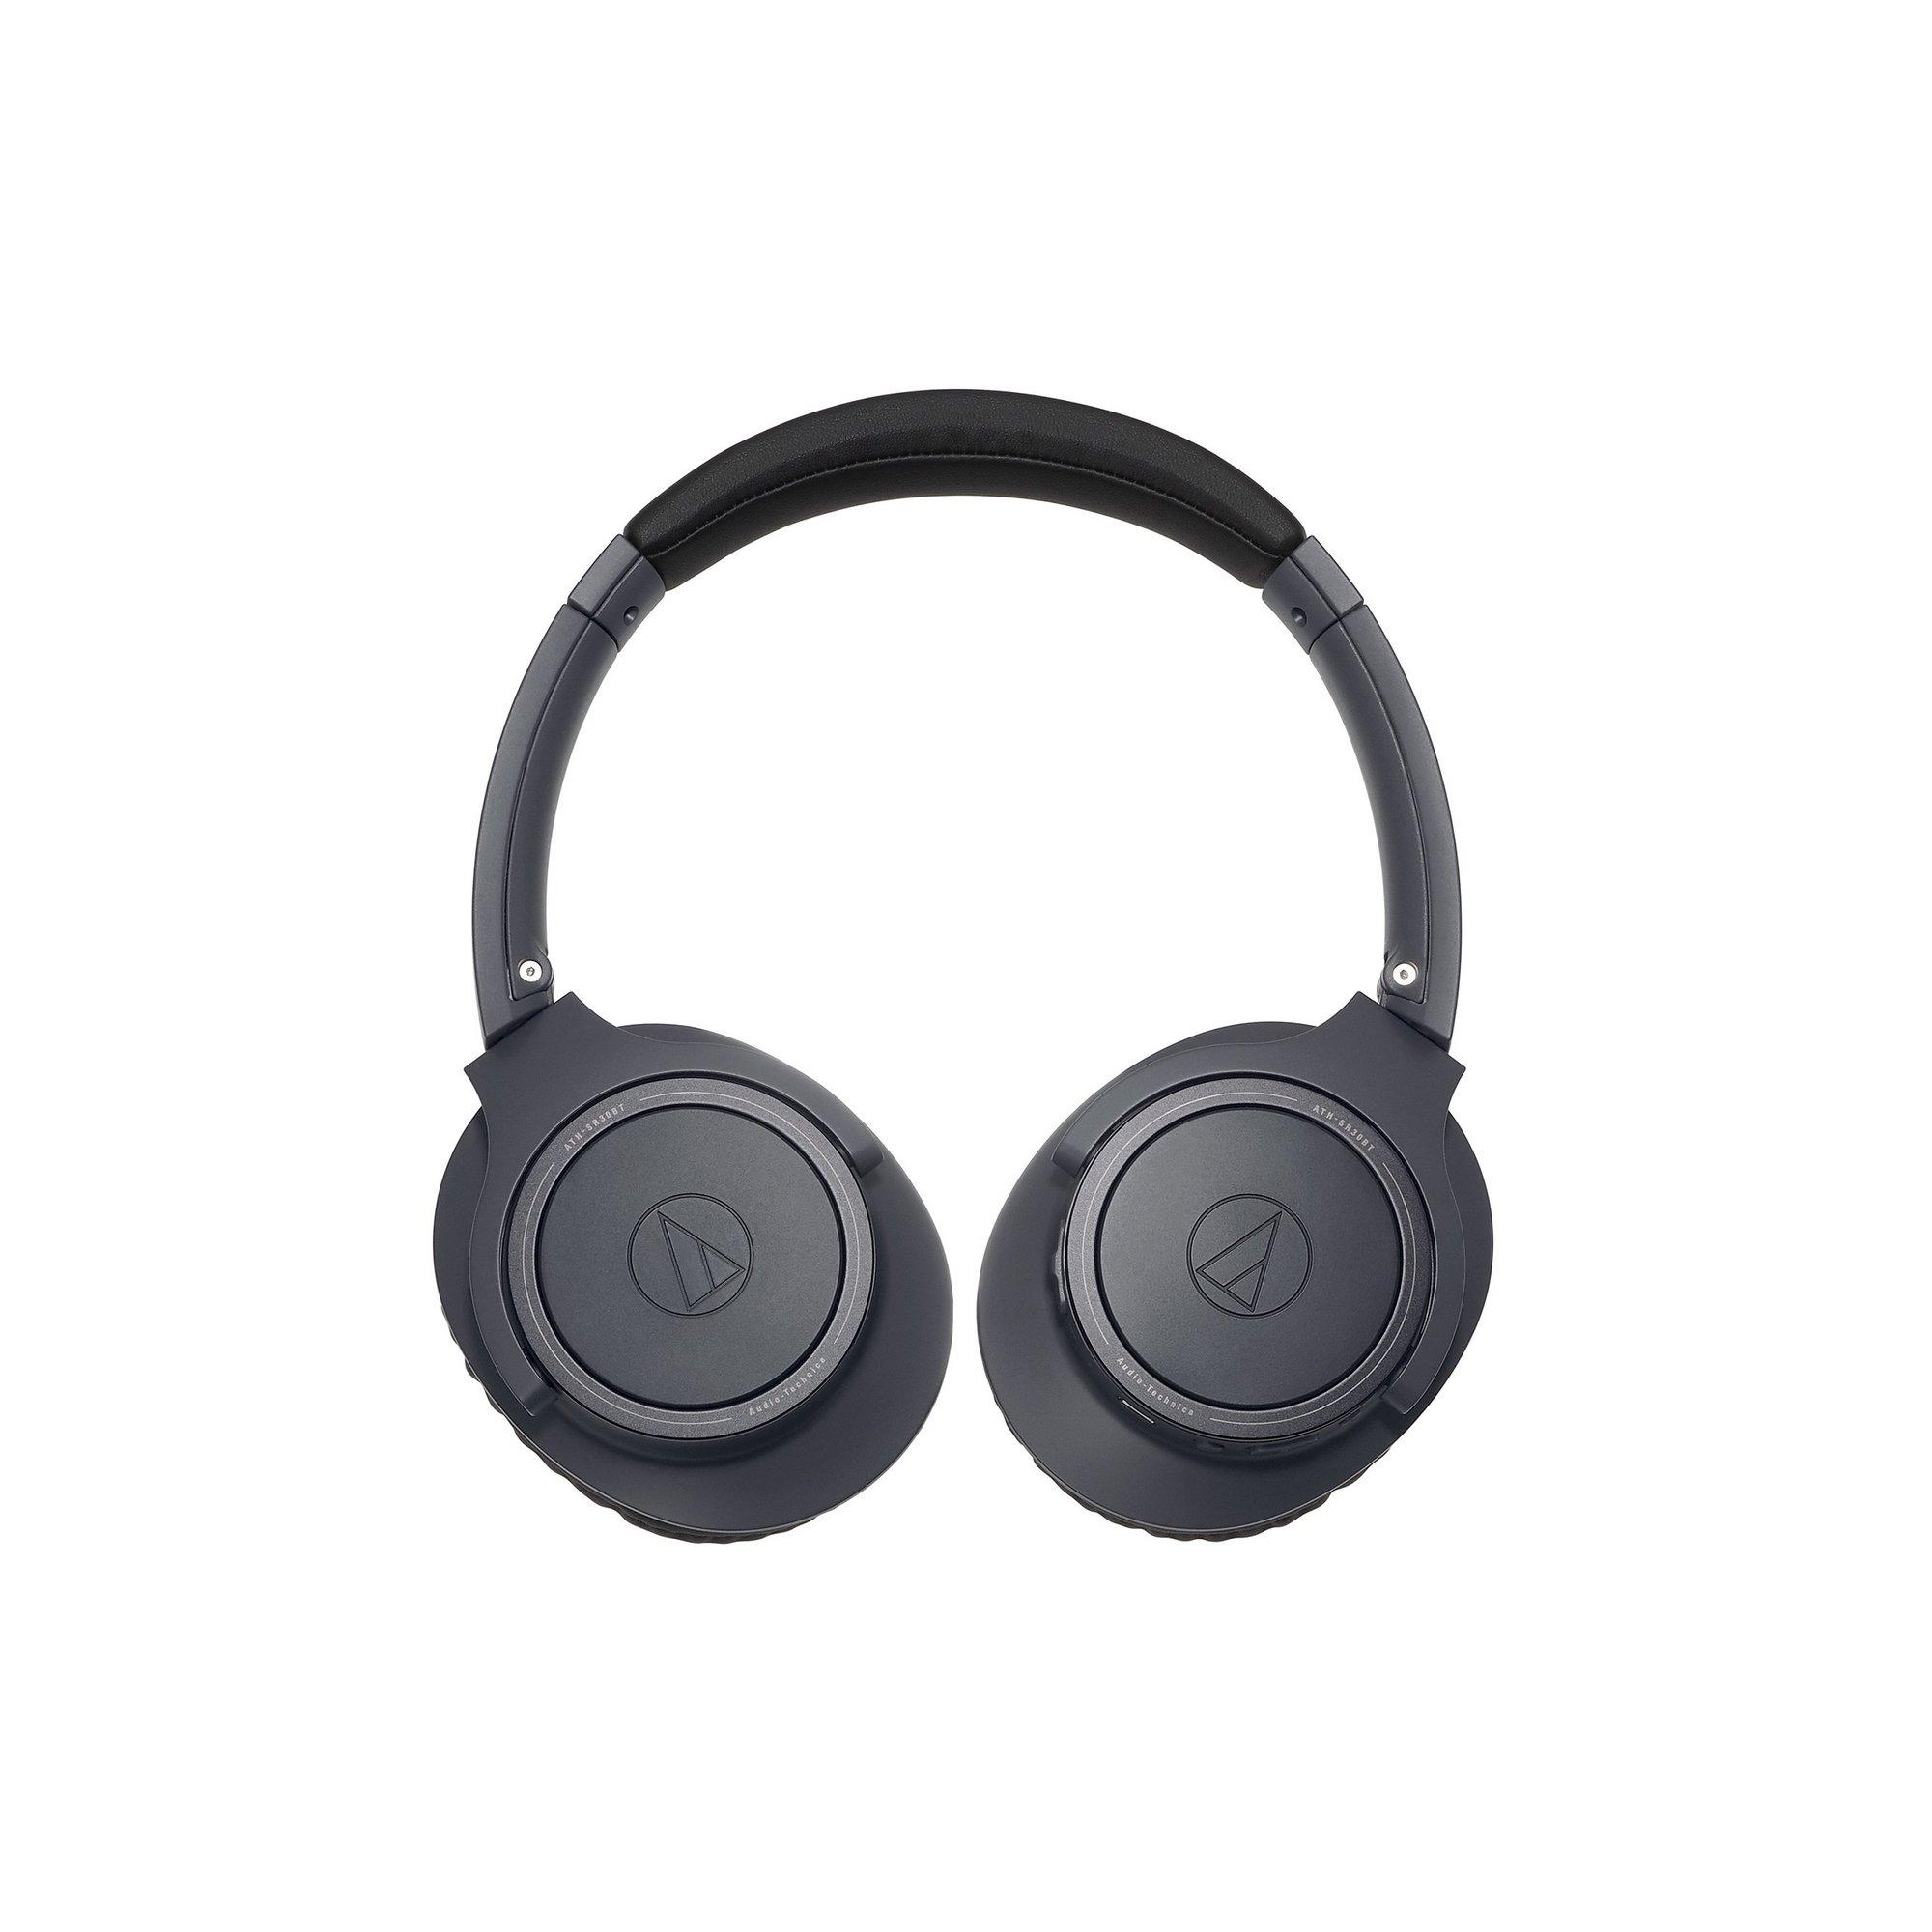 Image of Audio-Technica ATHSR30BTBK Wireless Headphones